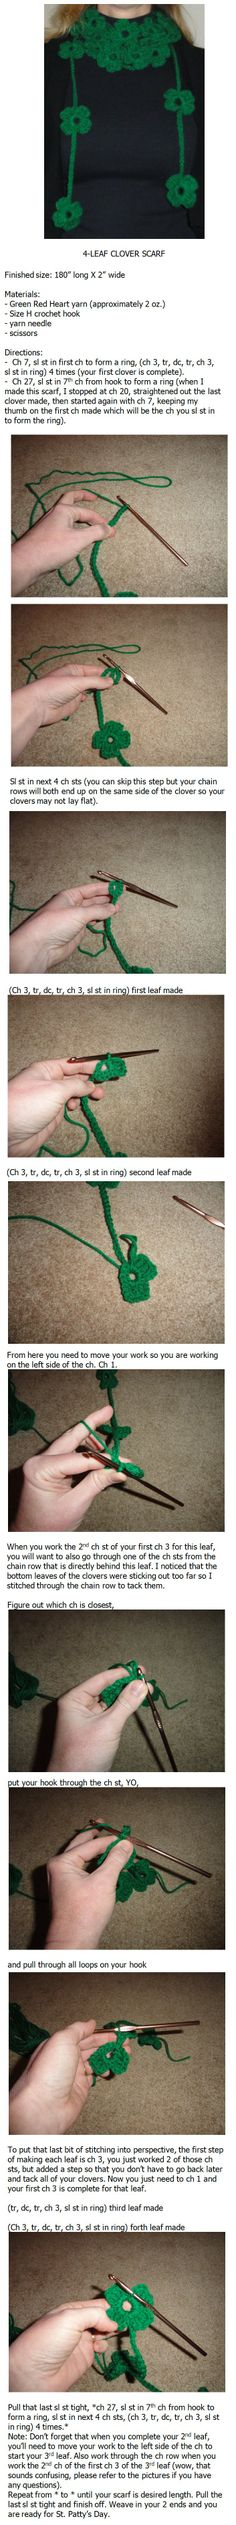 4-leaf clover scarf crochet pattern